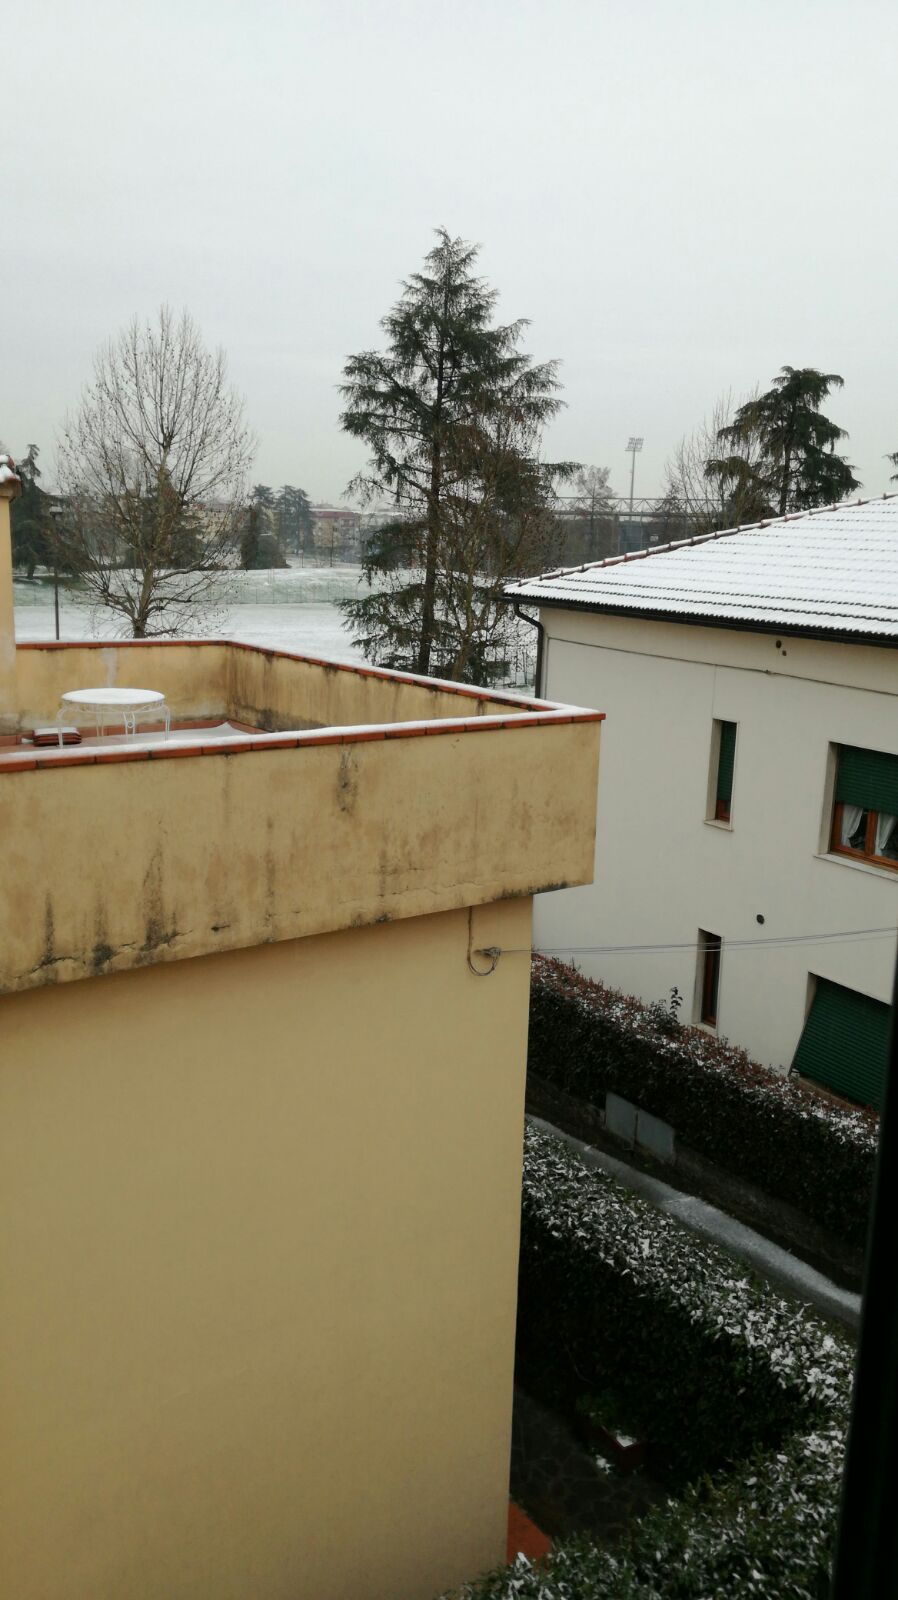 SNOW(e poi rain?)Casting Toscana Giovedi 1 marzo 2018-img-20180301-wa0125.jpg